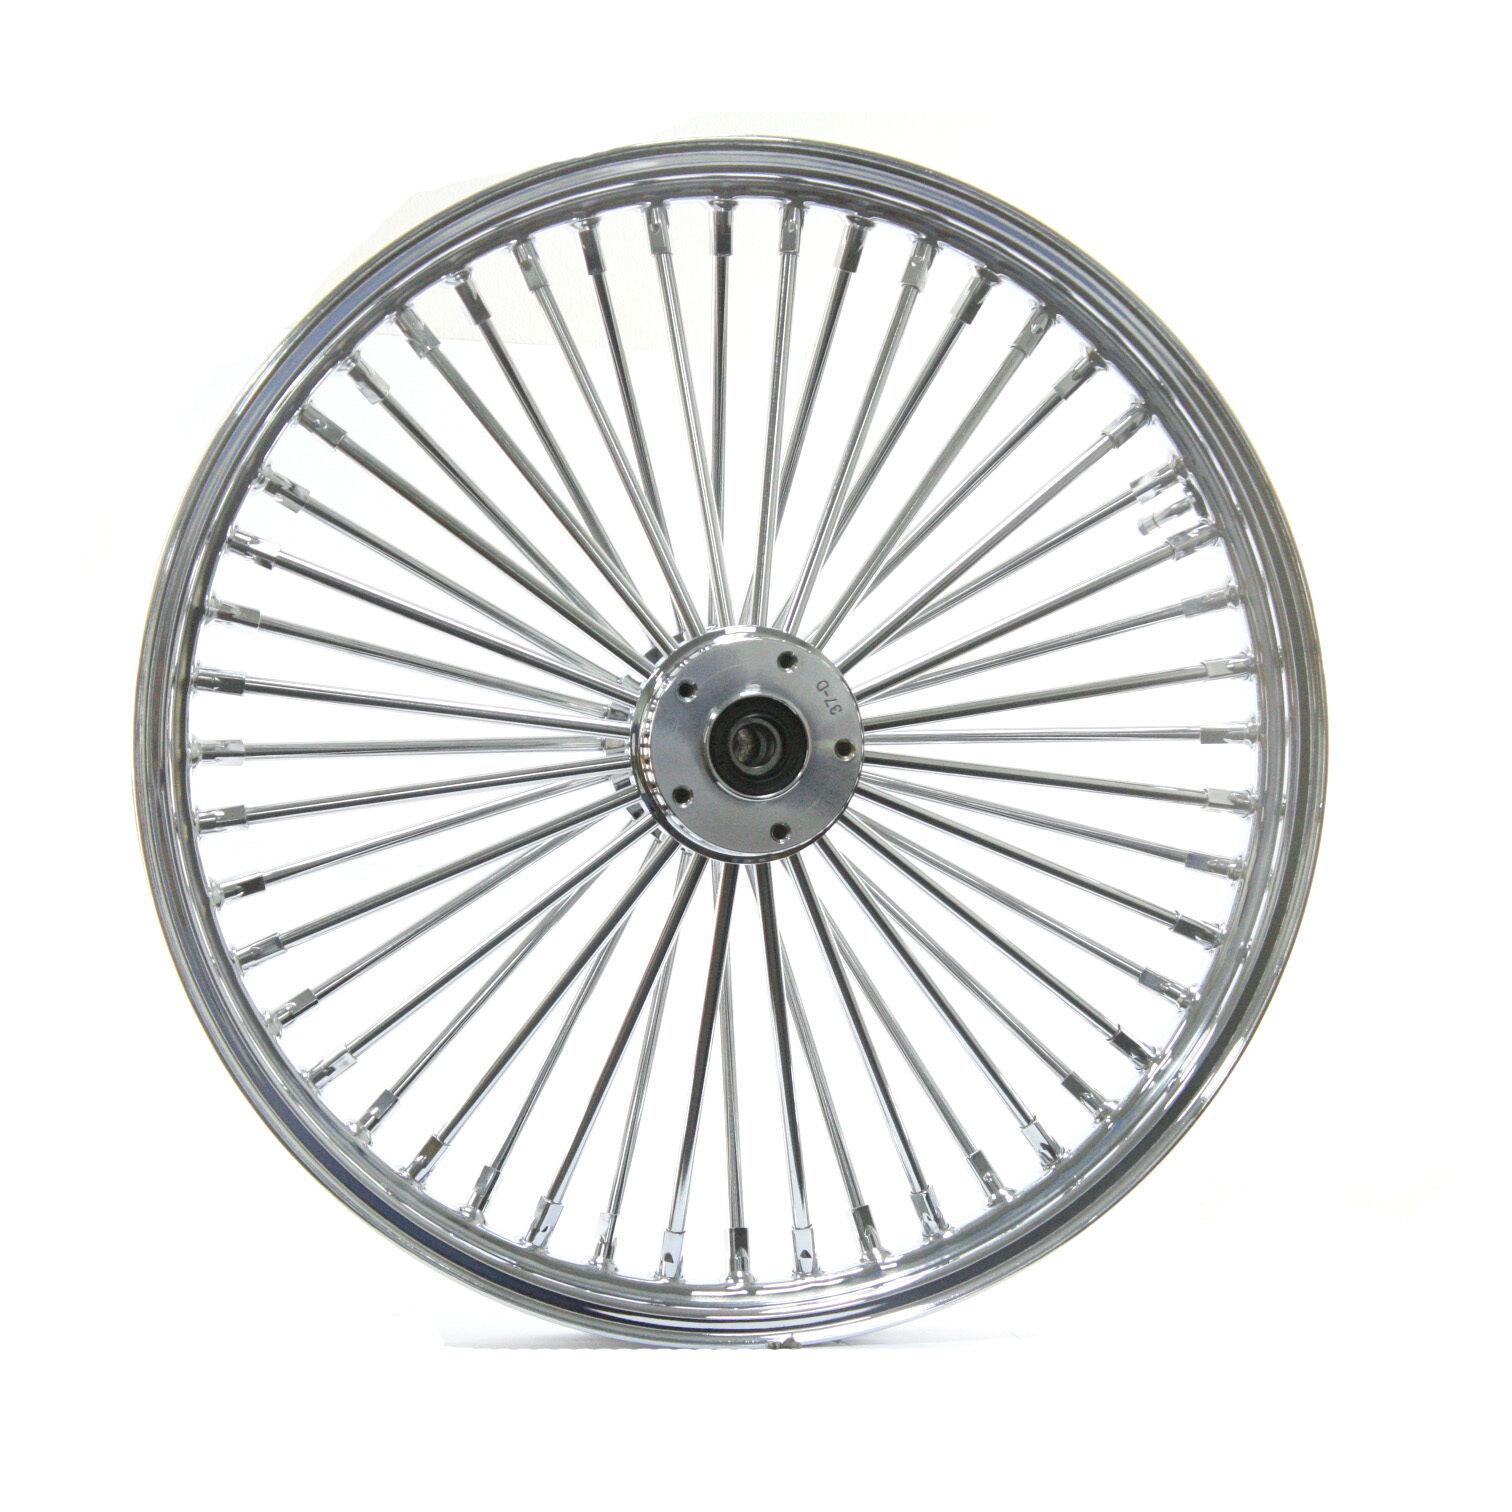 Fat Spoke Front Wheel Chrome 21 X 3 5 Harley Softail Flstn